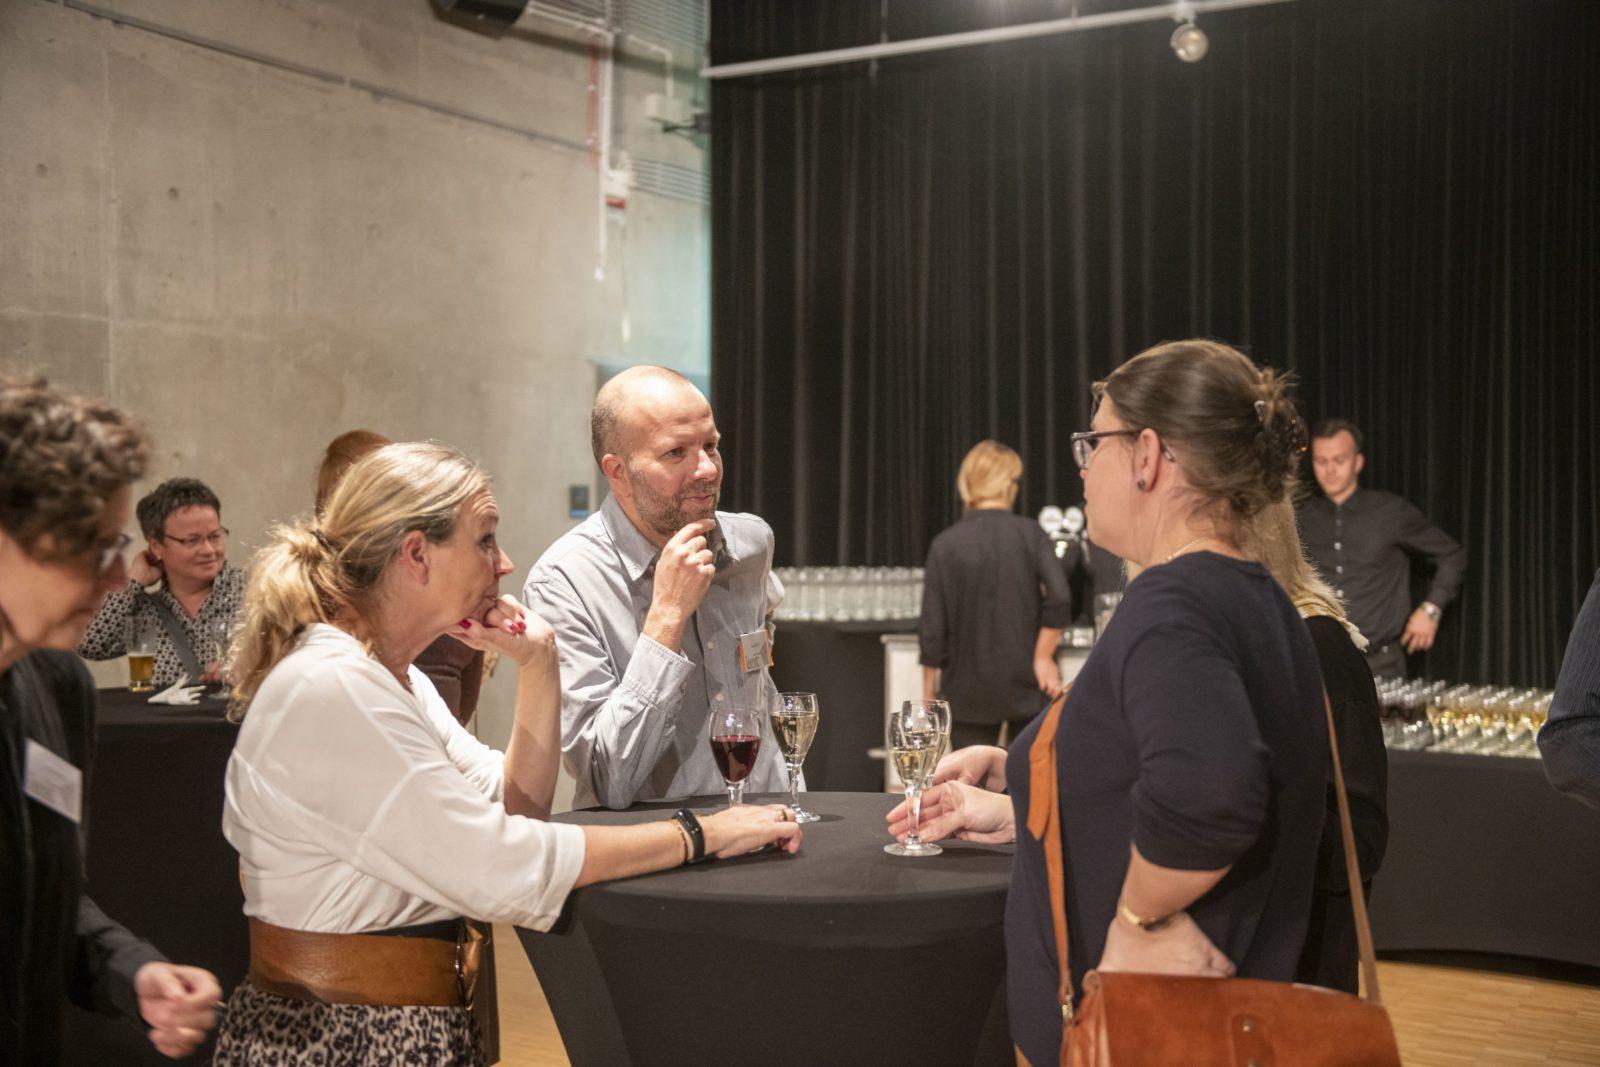 Warschau_2019_Empfang_reception_Thursday_Warsaw_Stasiuk_Konrad_260